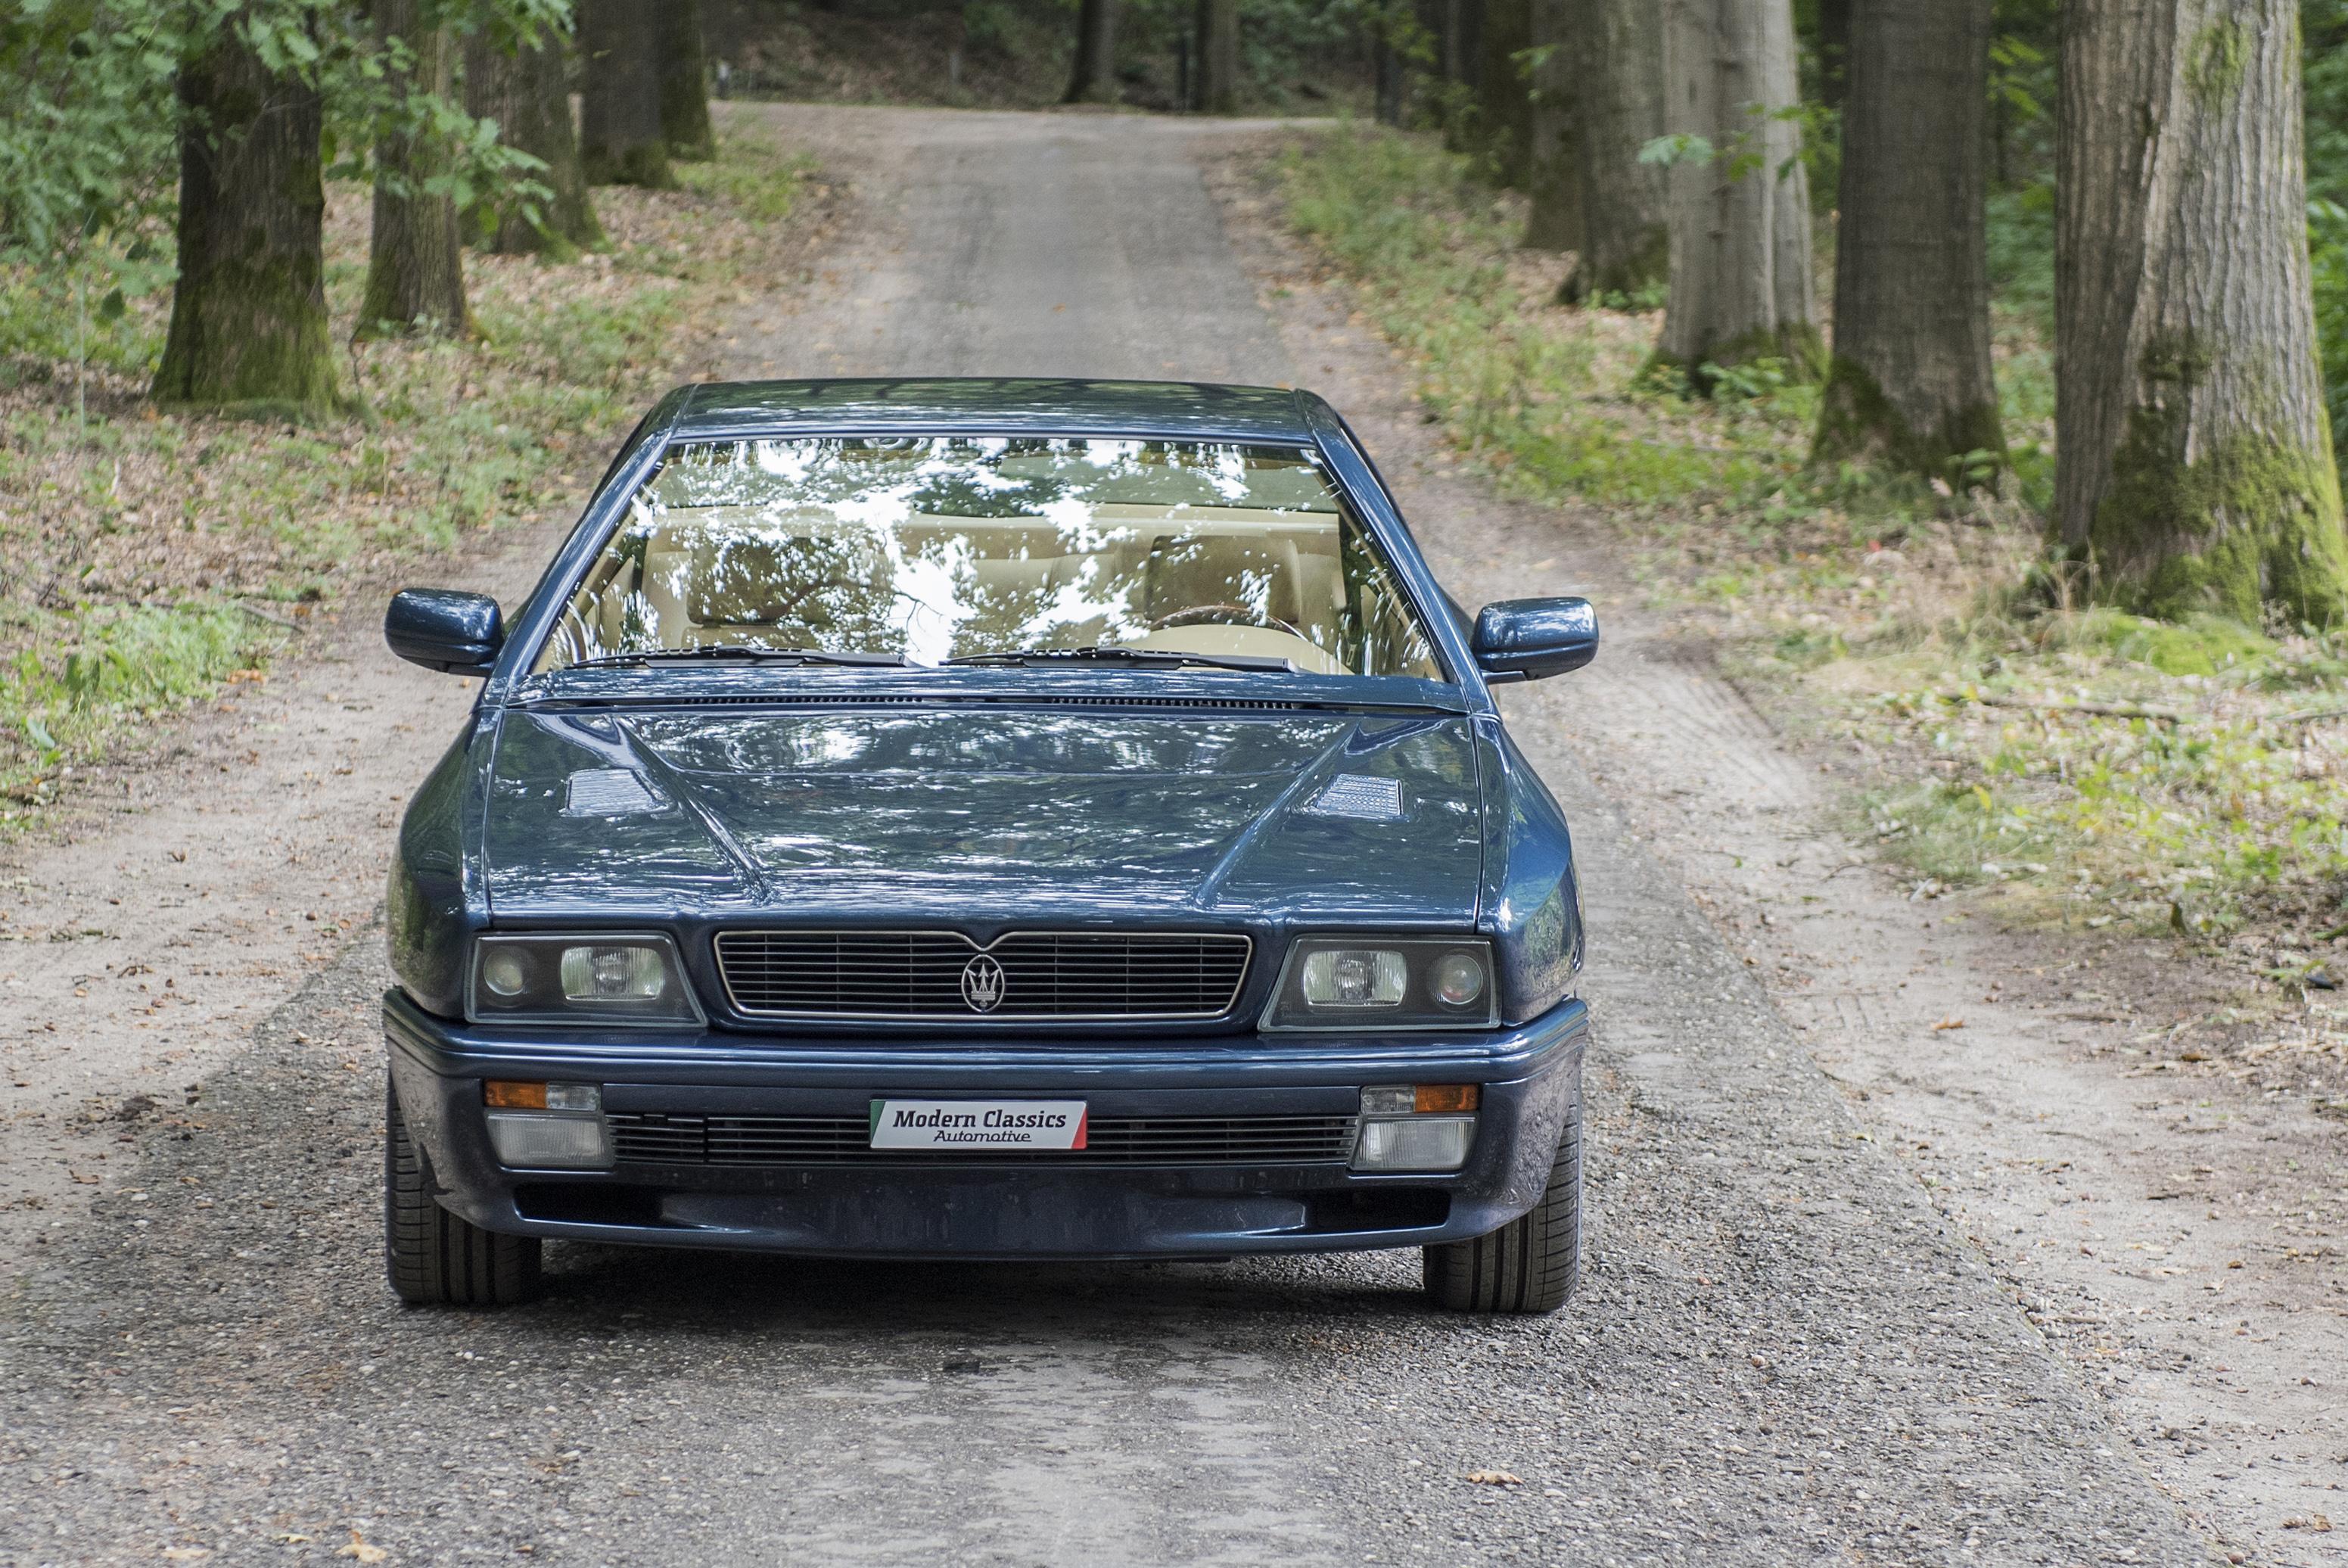 Maserati Ghibli MY94 ABS - Modern Classics Automotive